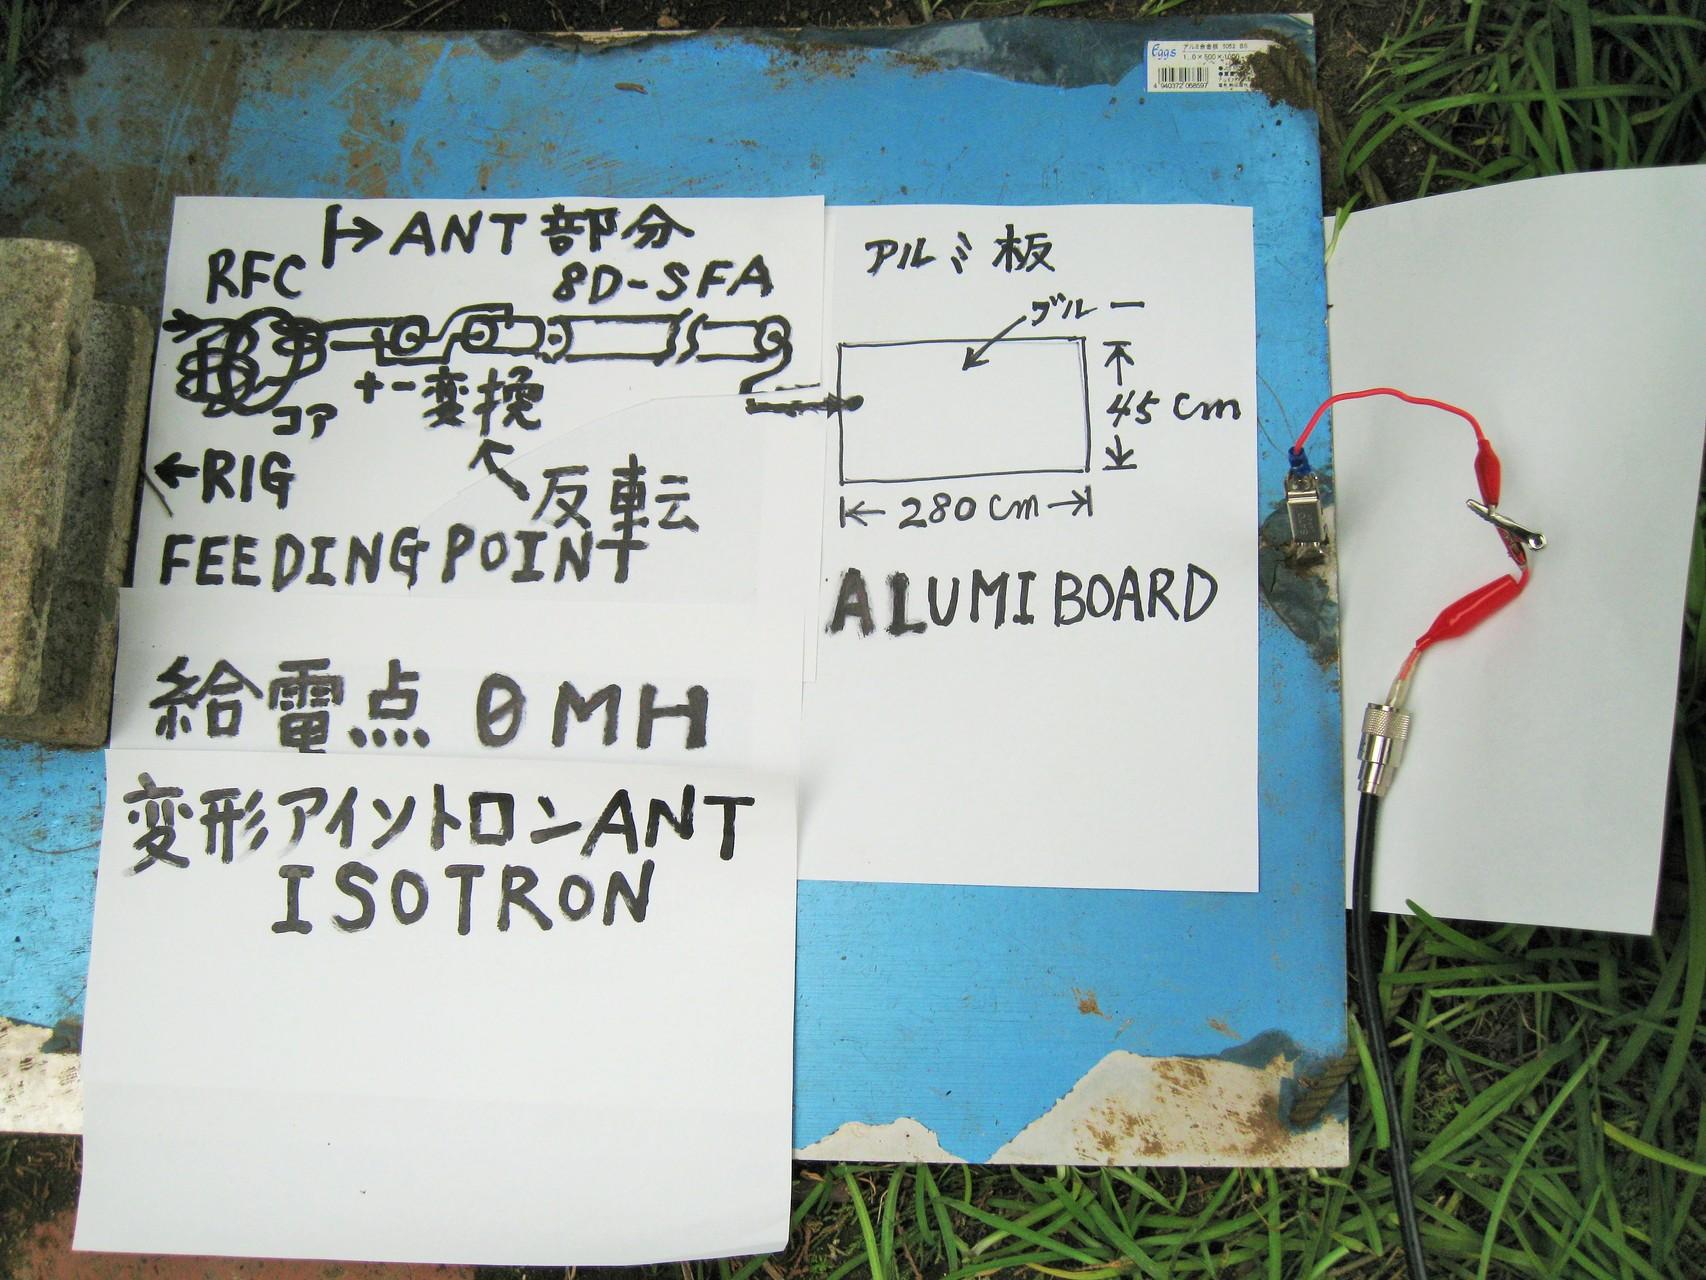 FEEDING POINT給電点0mH/15m長5D-SFA給電同軸ケーブル(+-逆給電)の芯線に+アルミ板接続:変形ISOTRON ANT